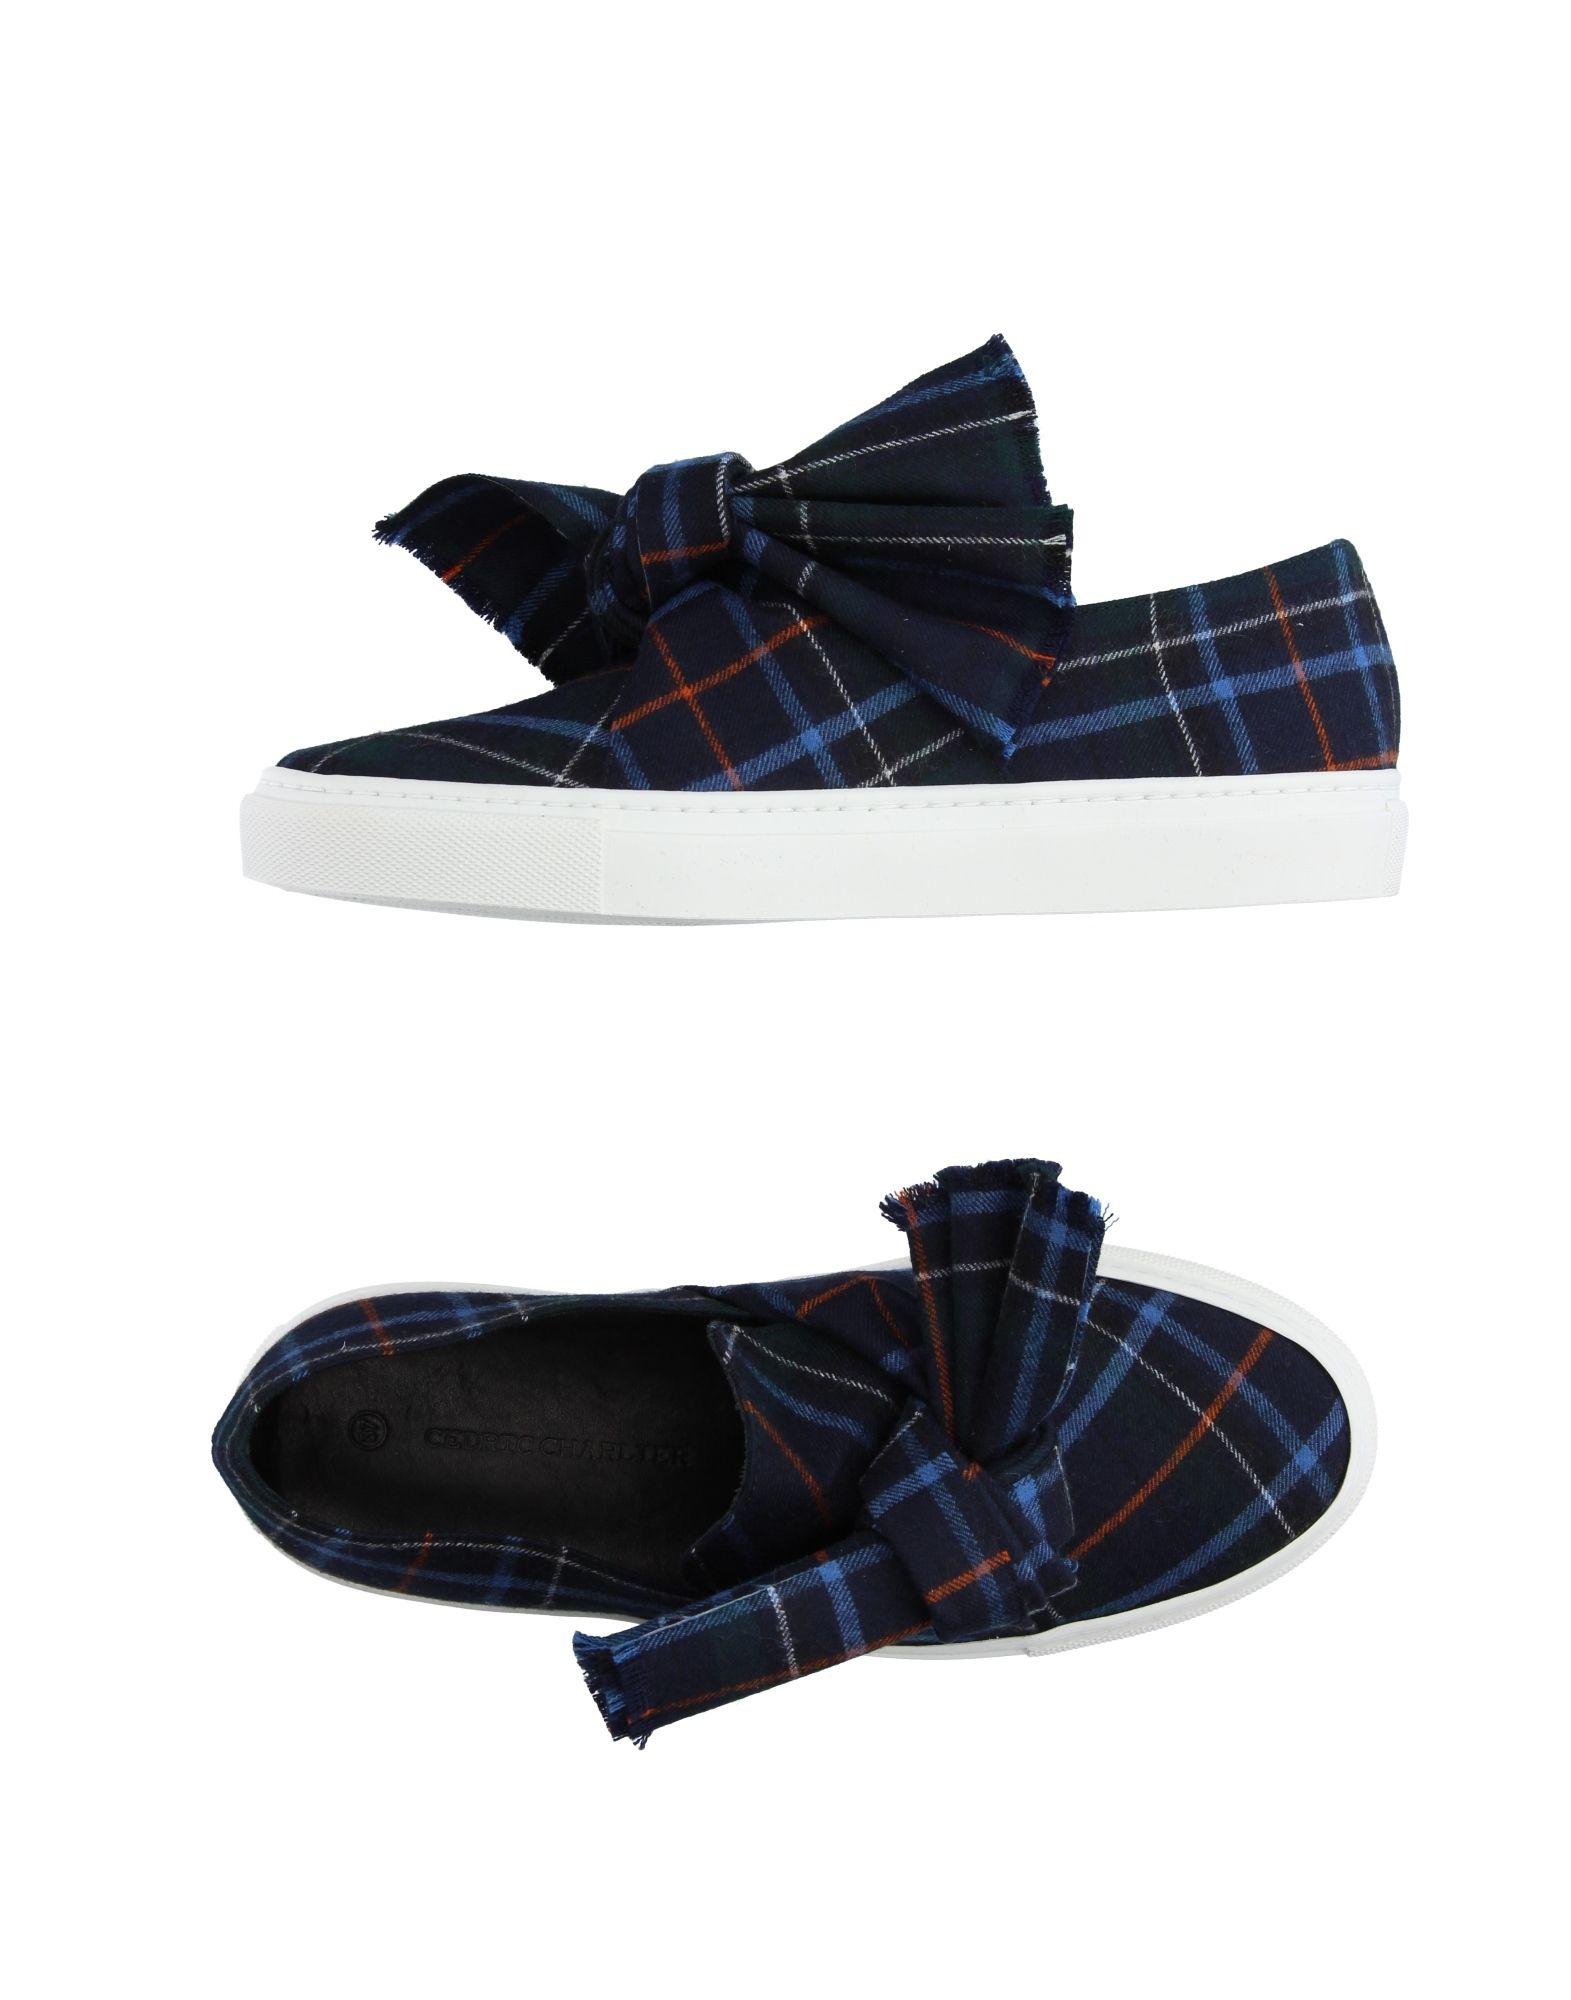 Cedric Charlier Schuhe Sneakers Damen  11215086HI Neue Schuhe Charlier d4e940